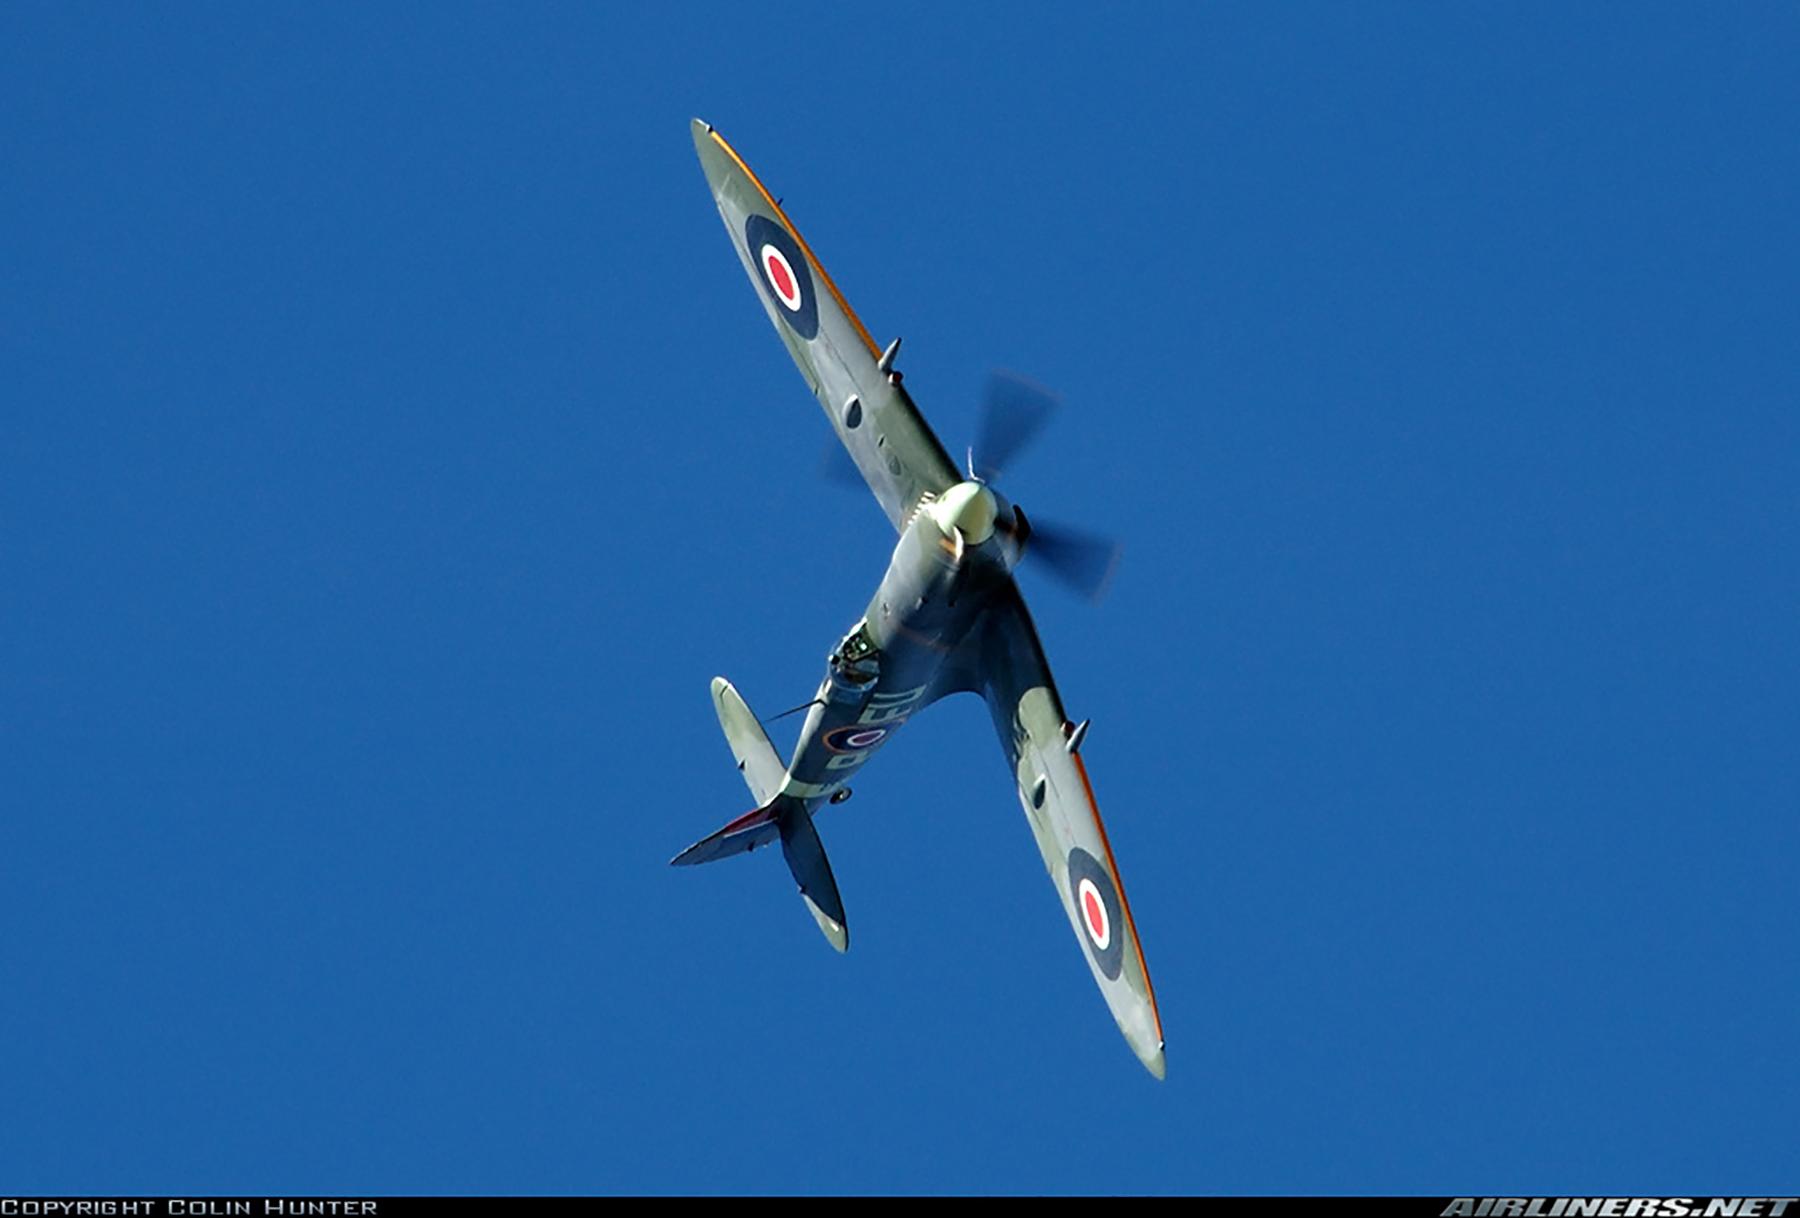 Airworthy Spitfire warbird LFXVI RAAF 453Sqn FUP TB863 12